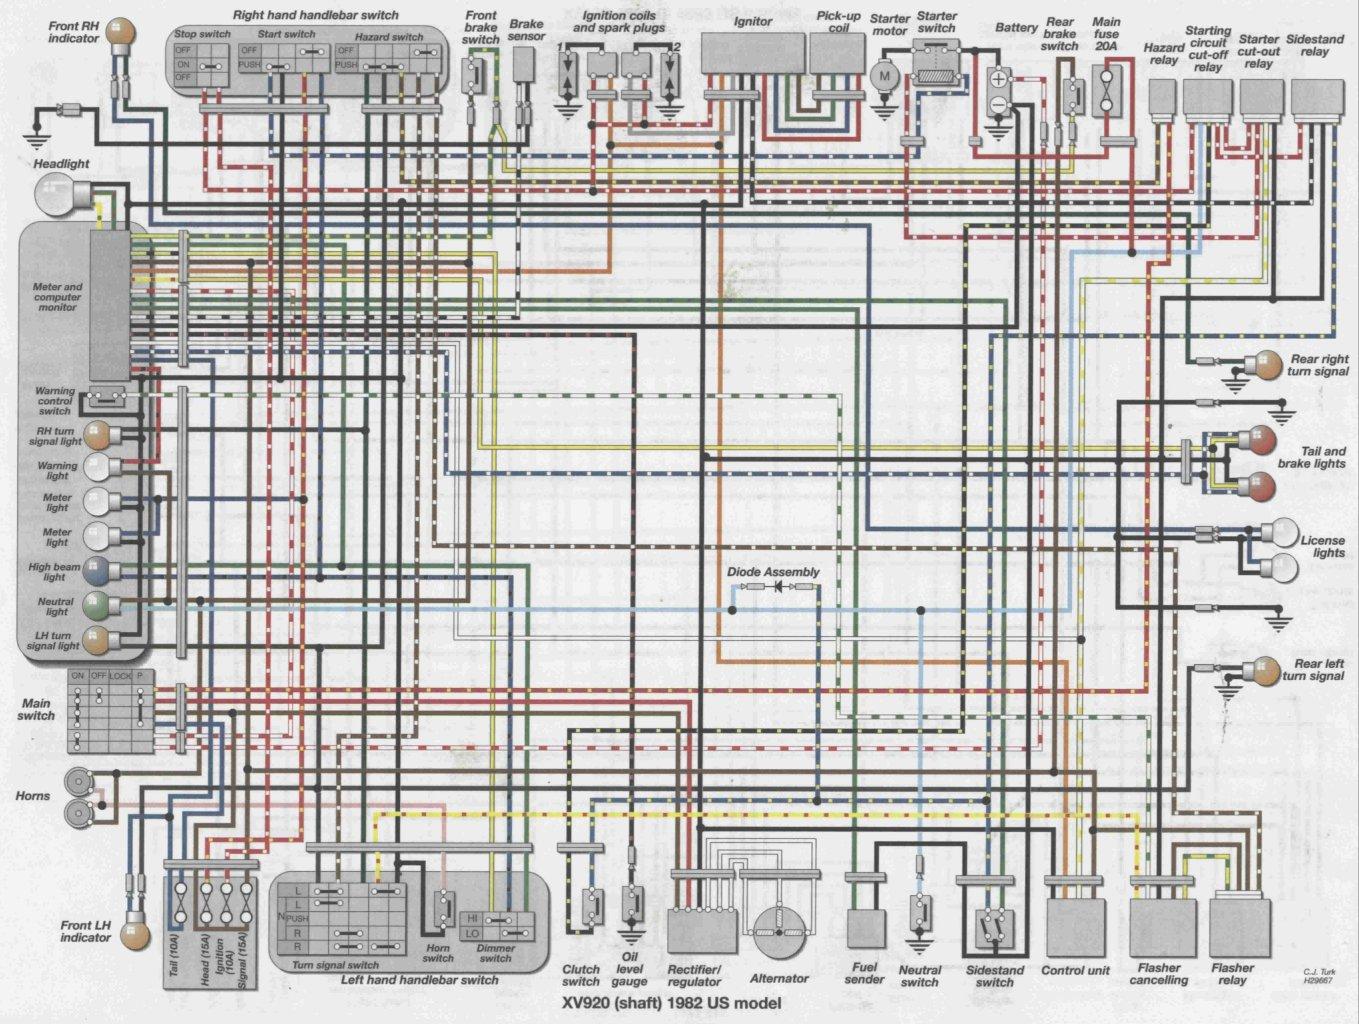 Wiring Diagram Schematic Viragotechforum Com View Topic Wiring Nightmare On 920